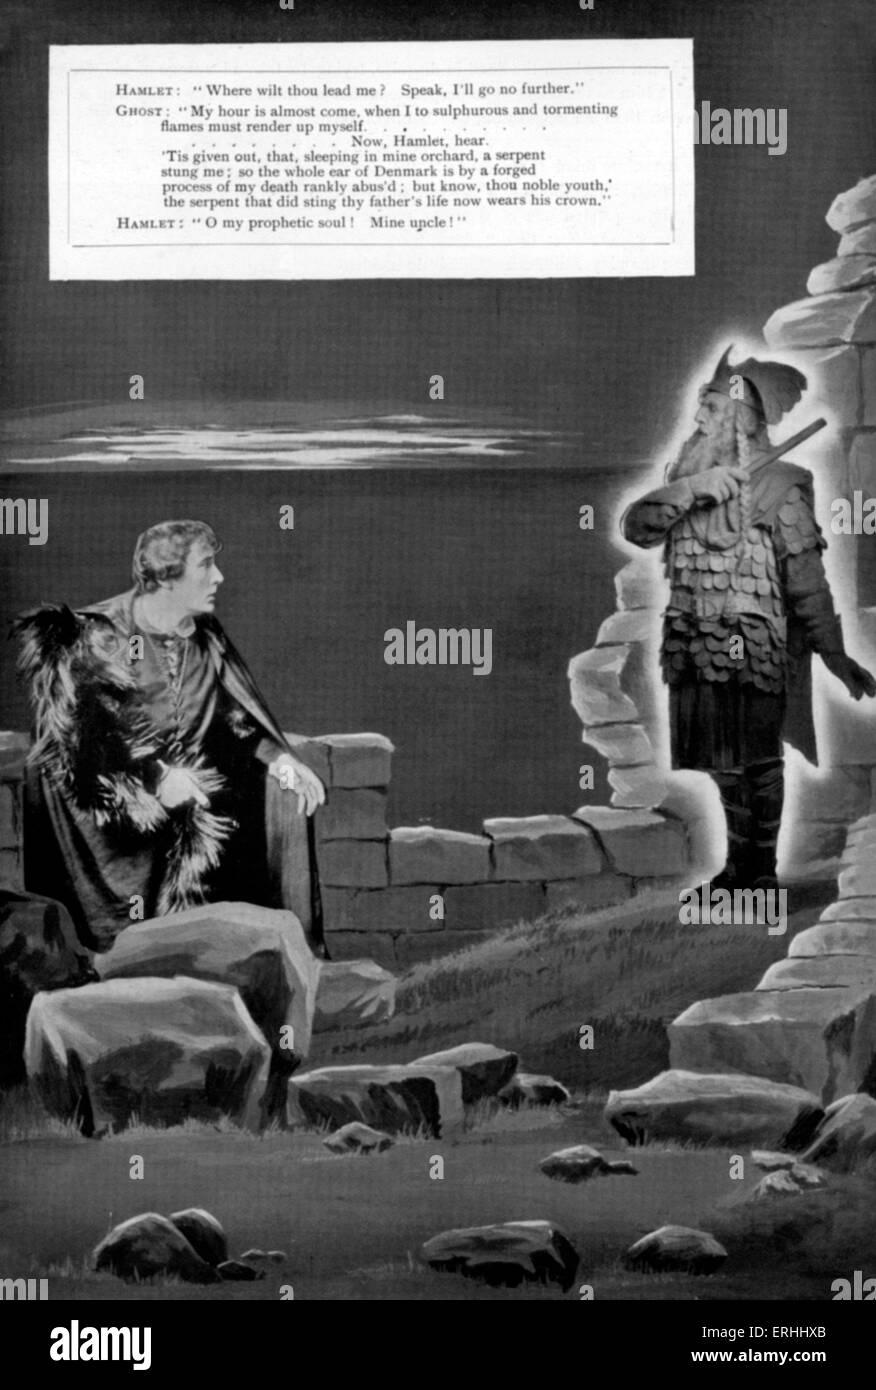 William Shakespeare 's play 'Hamlet' - Act I, scene 5: Hamlet (Henry Brodribb Irving) and the ghost - Stock Image